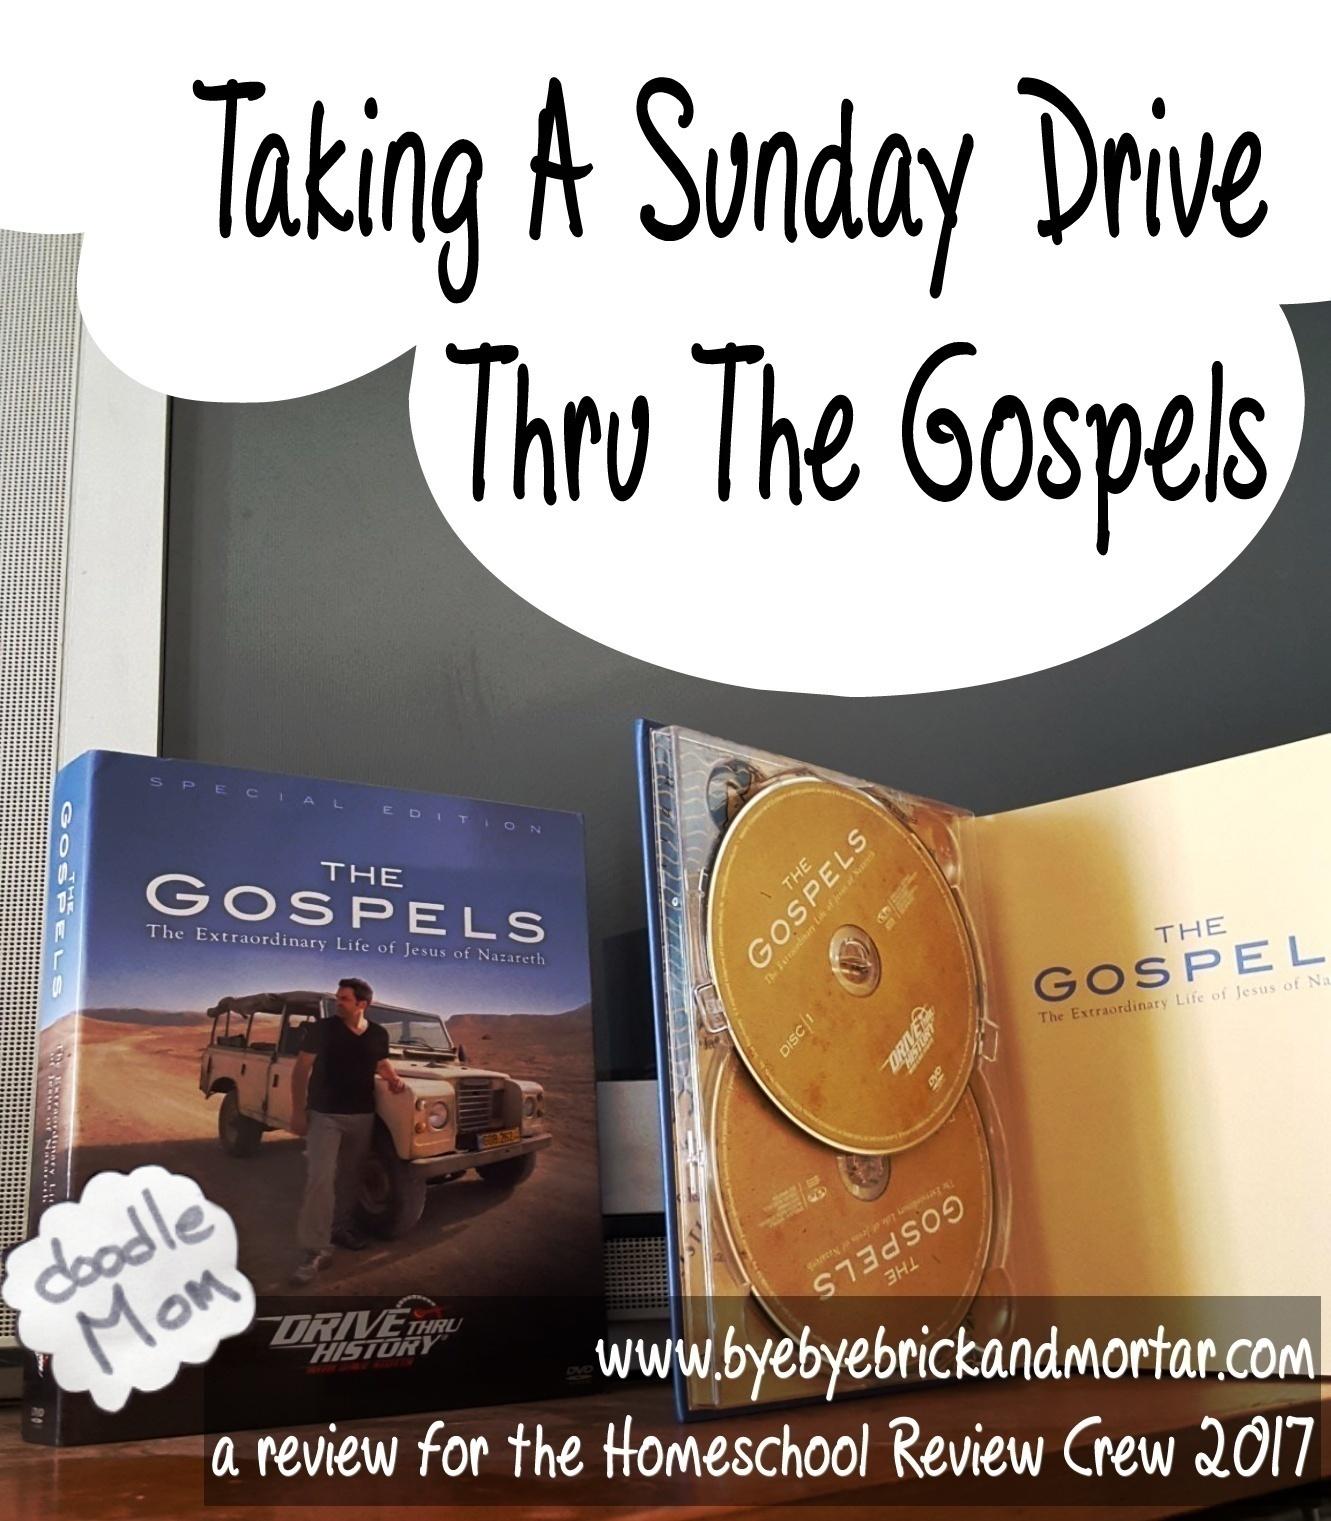 Taking a Sunday Drive Thru The Gospels